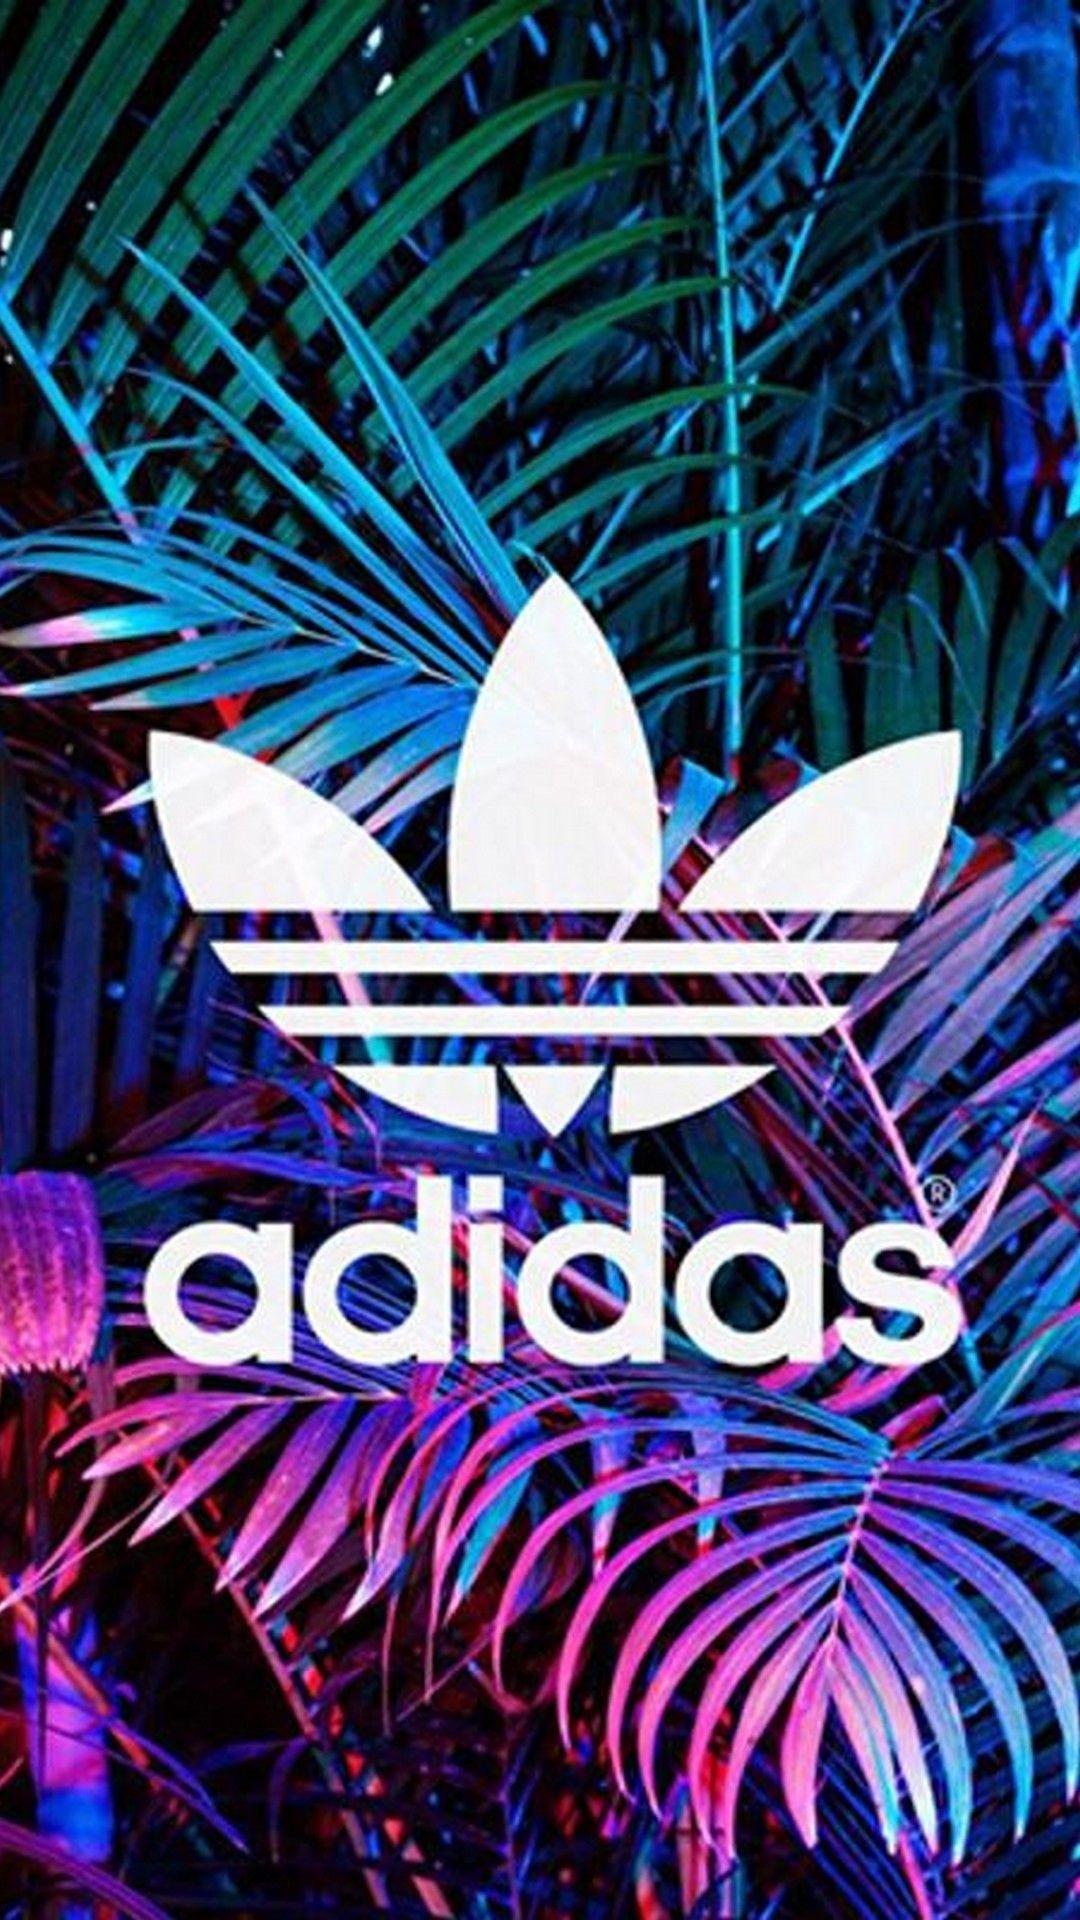 Black Adidas hd wallpaper